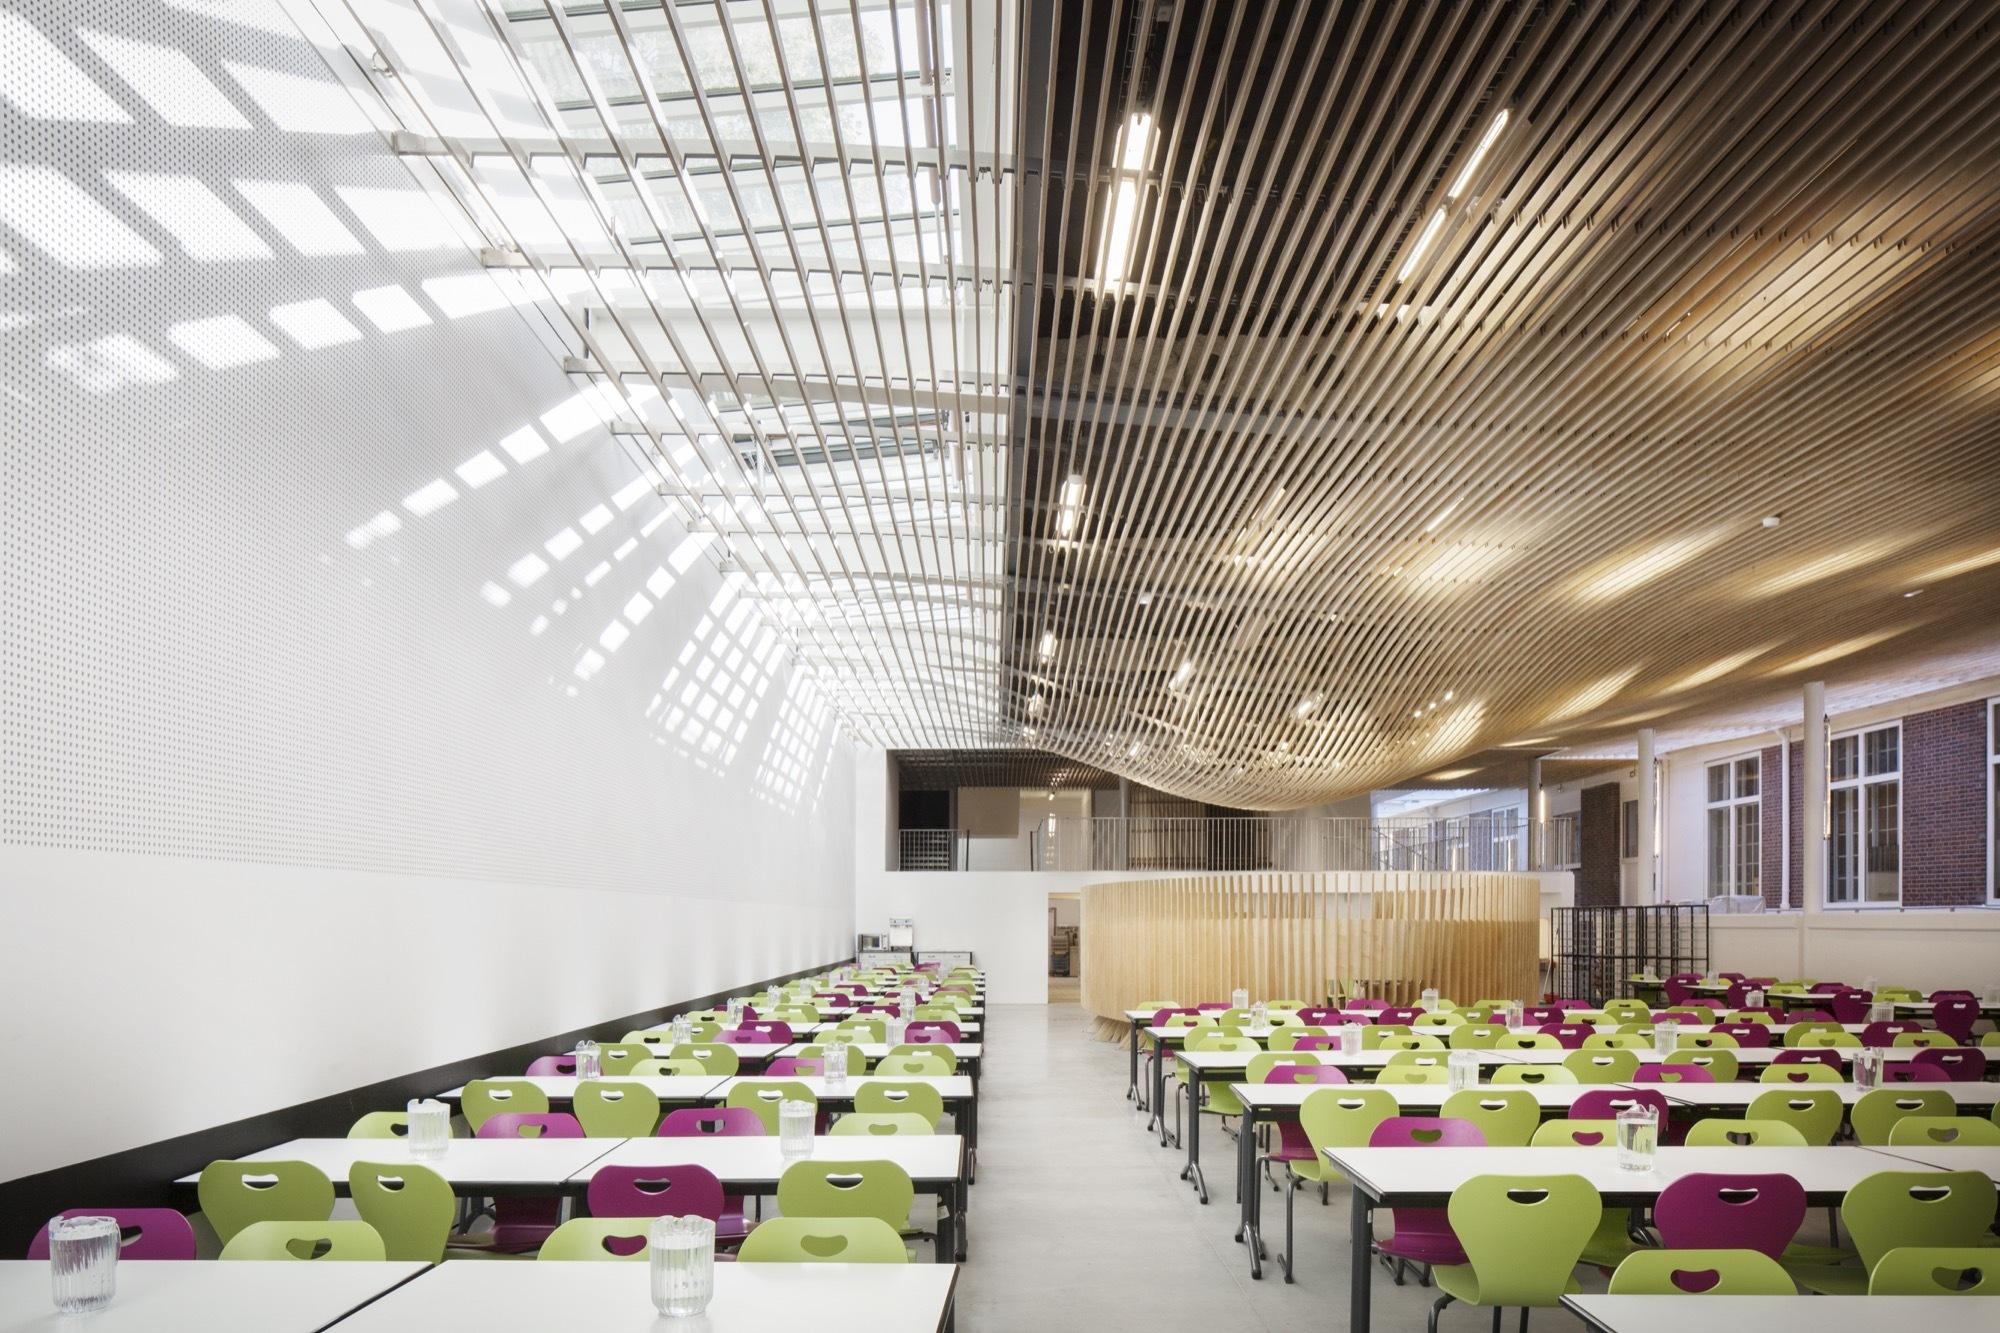 School Canteen Design Ideas